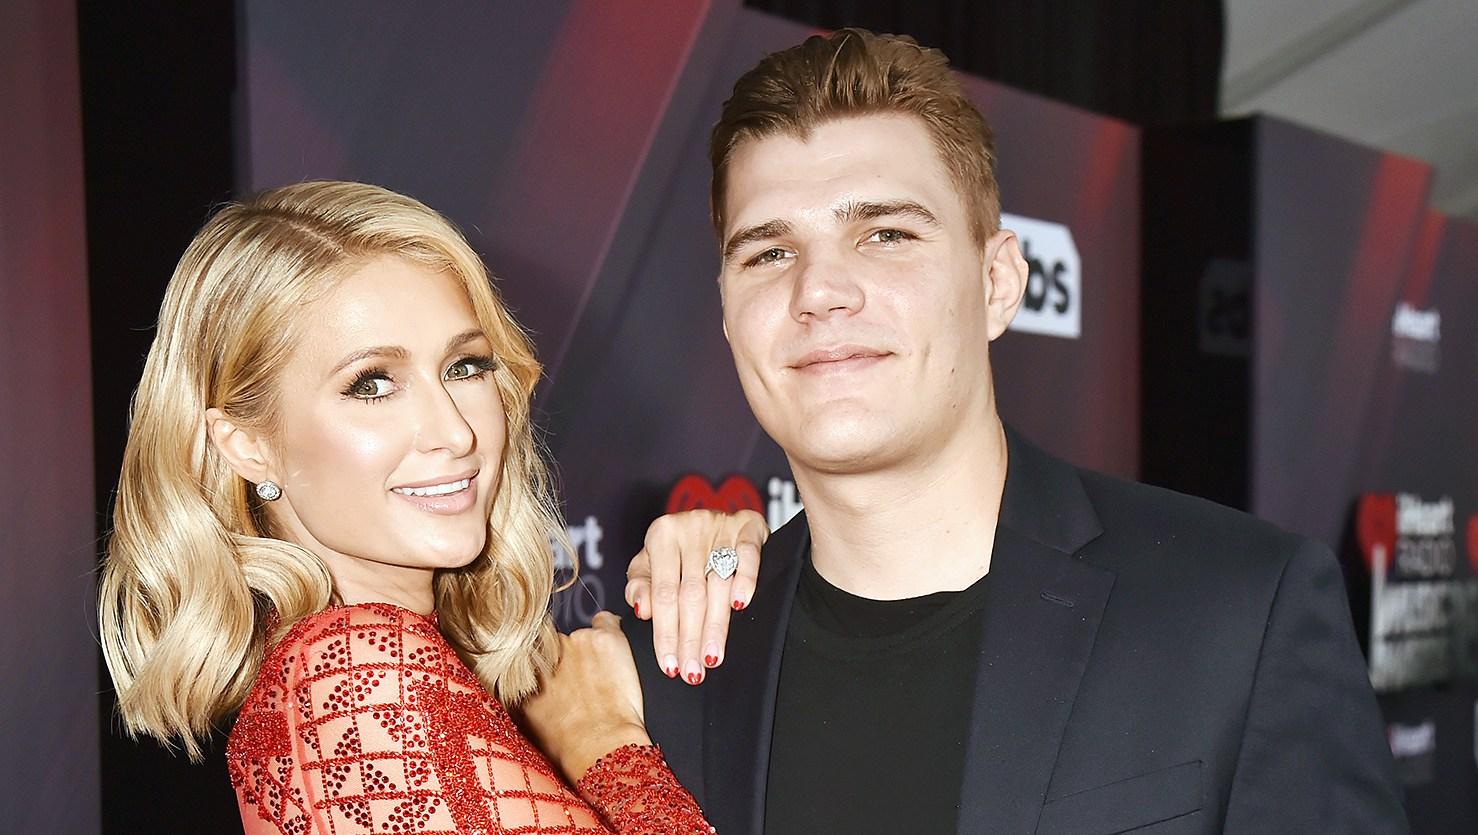 Paris Hilton Lost Engagement Ring While Dancing at Miami Nightclub